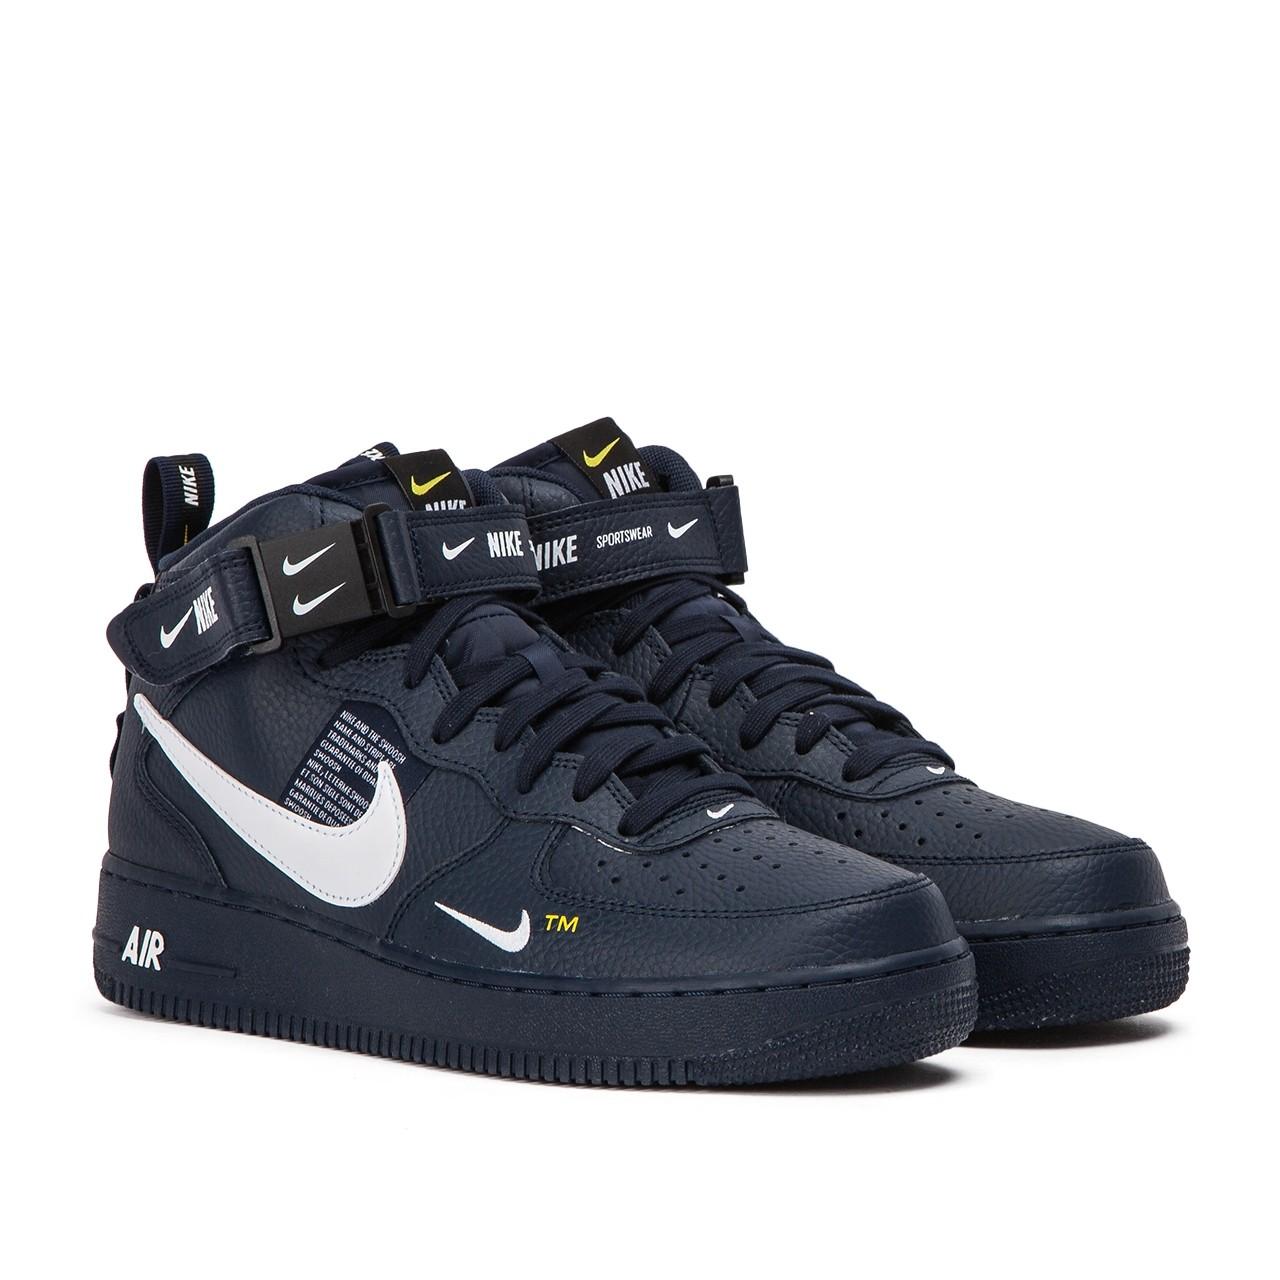 cba43265e43 Nike Air Force 1 Mid '07 Utility Navy | Pro Basketball